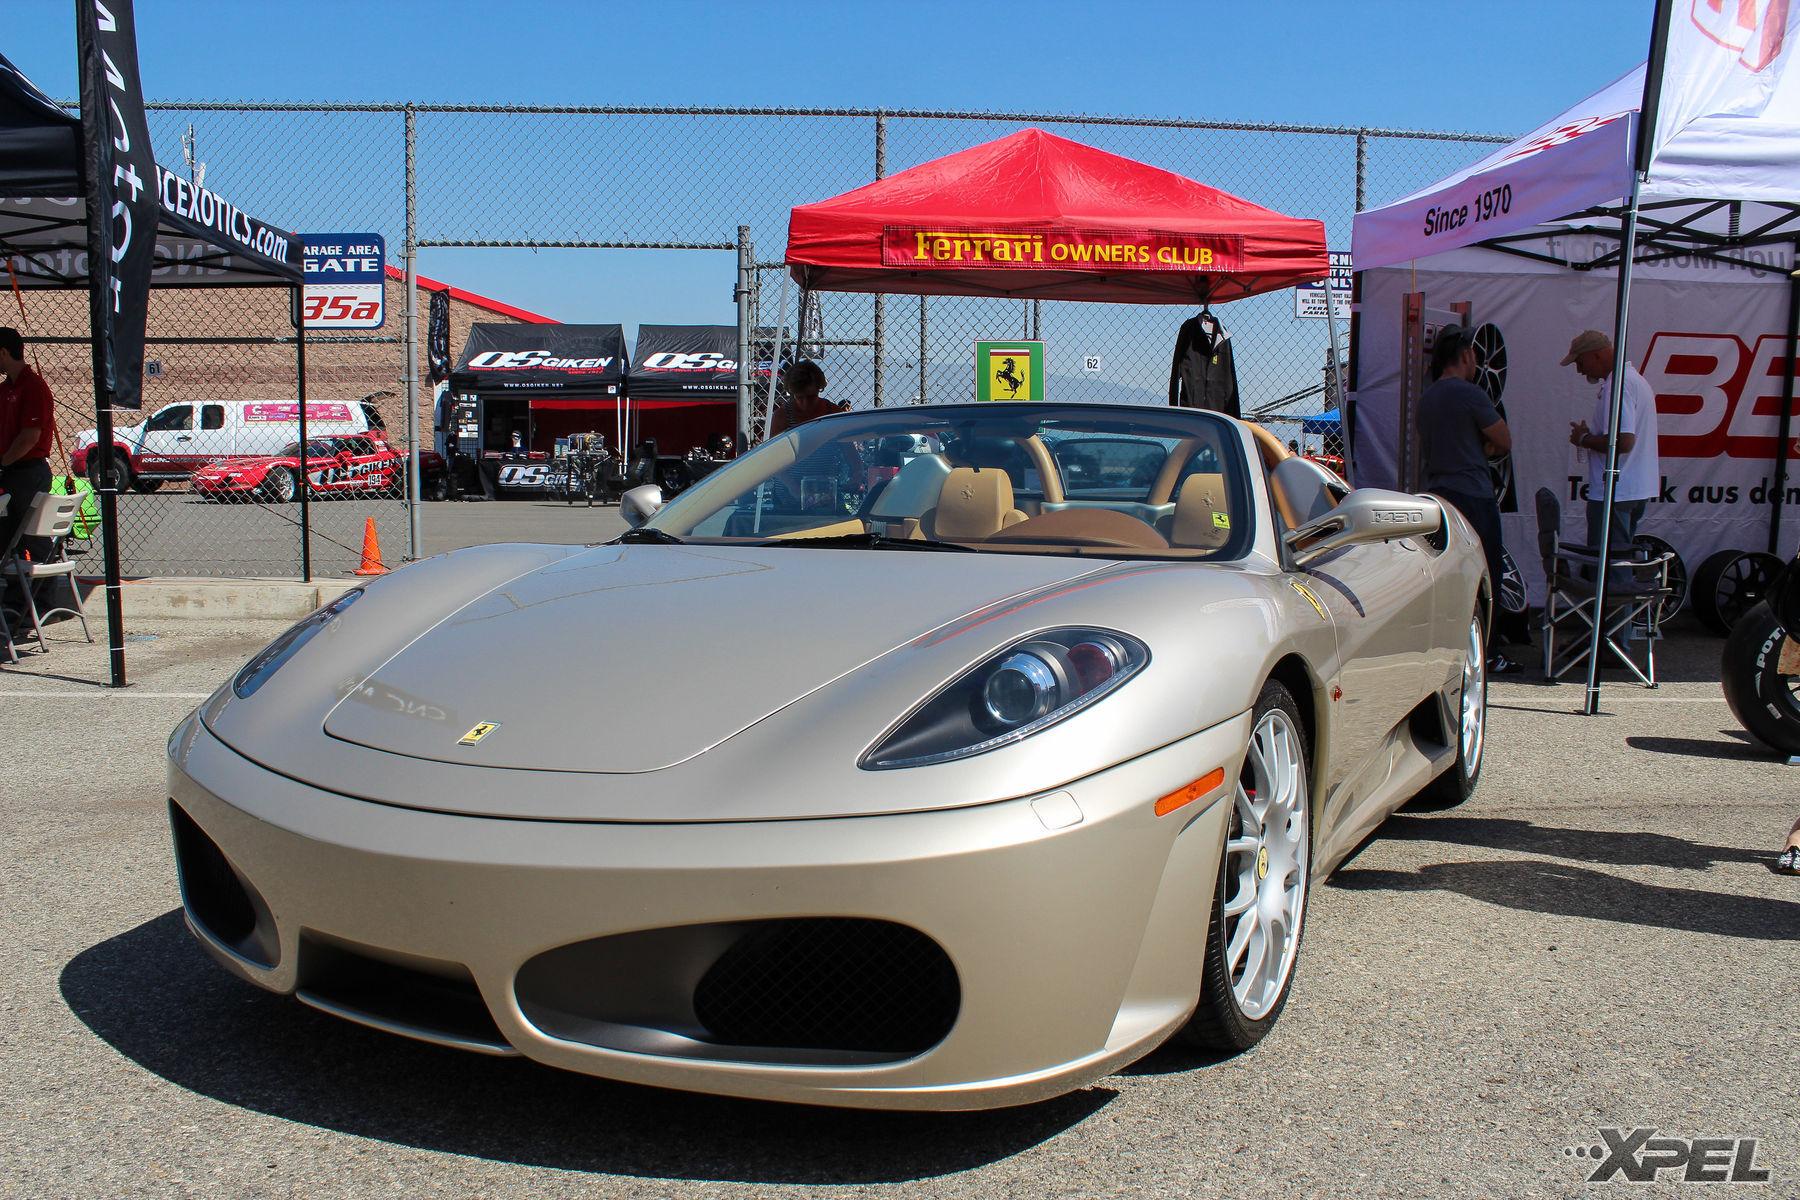 | Nice looking Ferrari at the Ferrari Owners Club tent